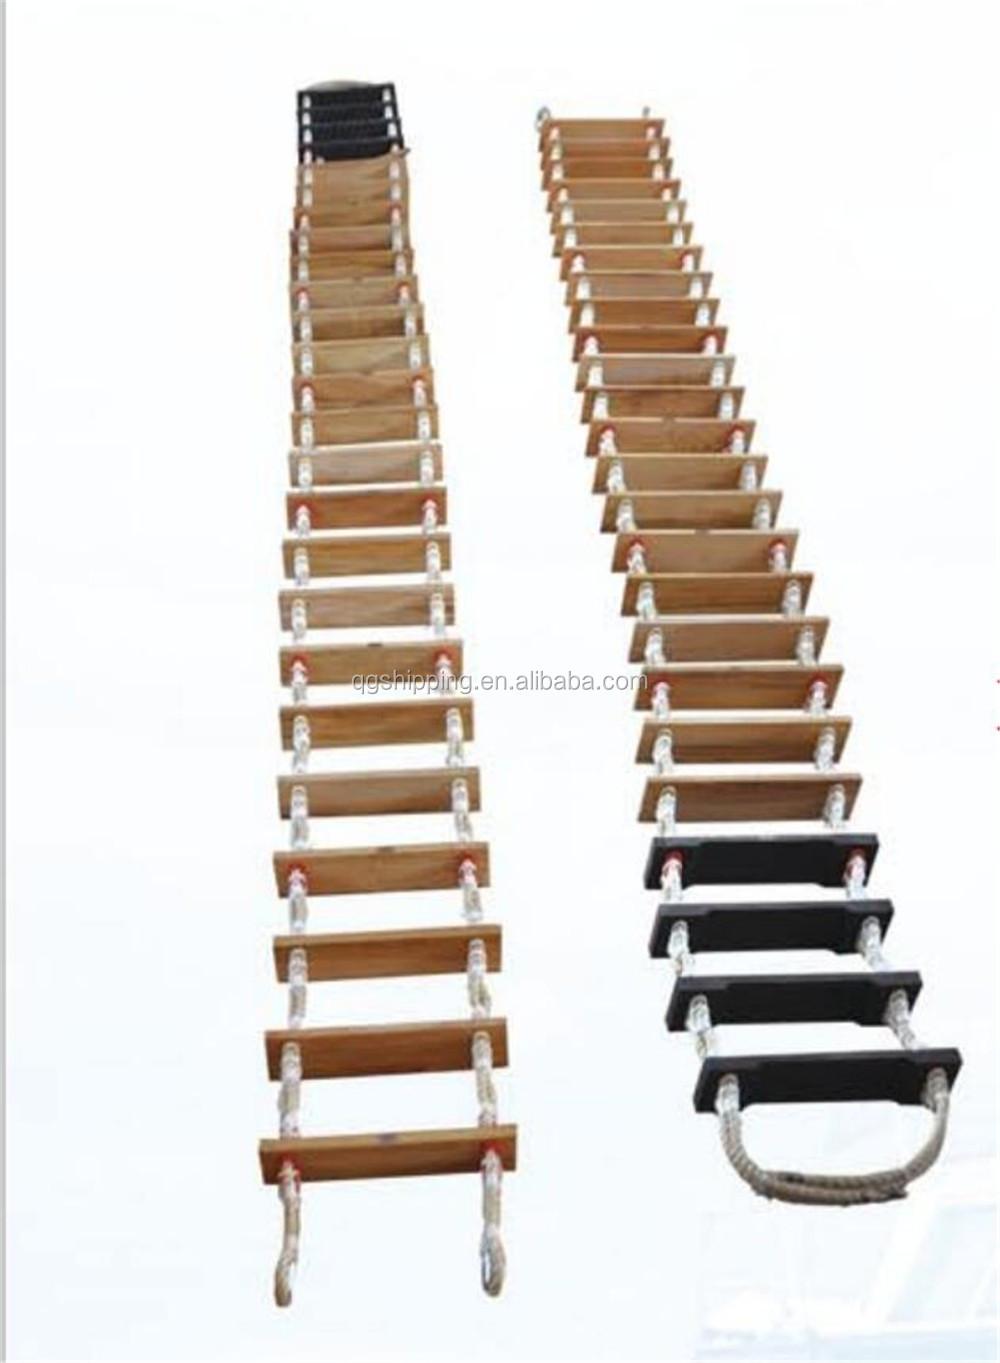 High Quality Ship Embarkation Rope Ladder Buy Ship